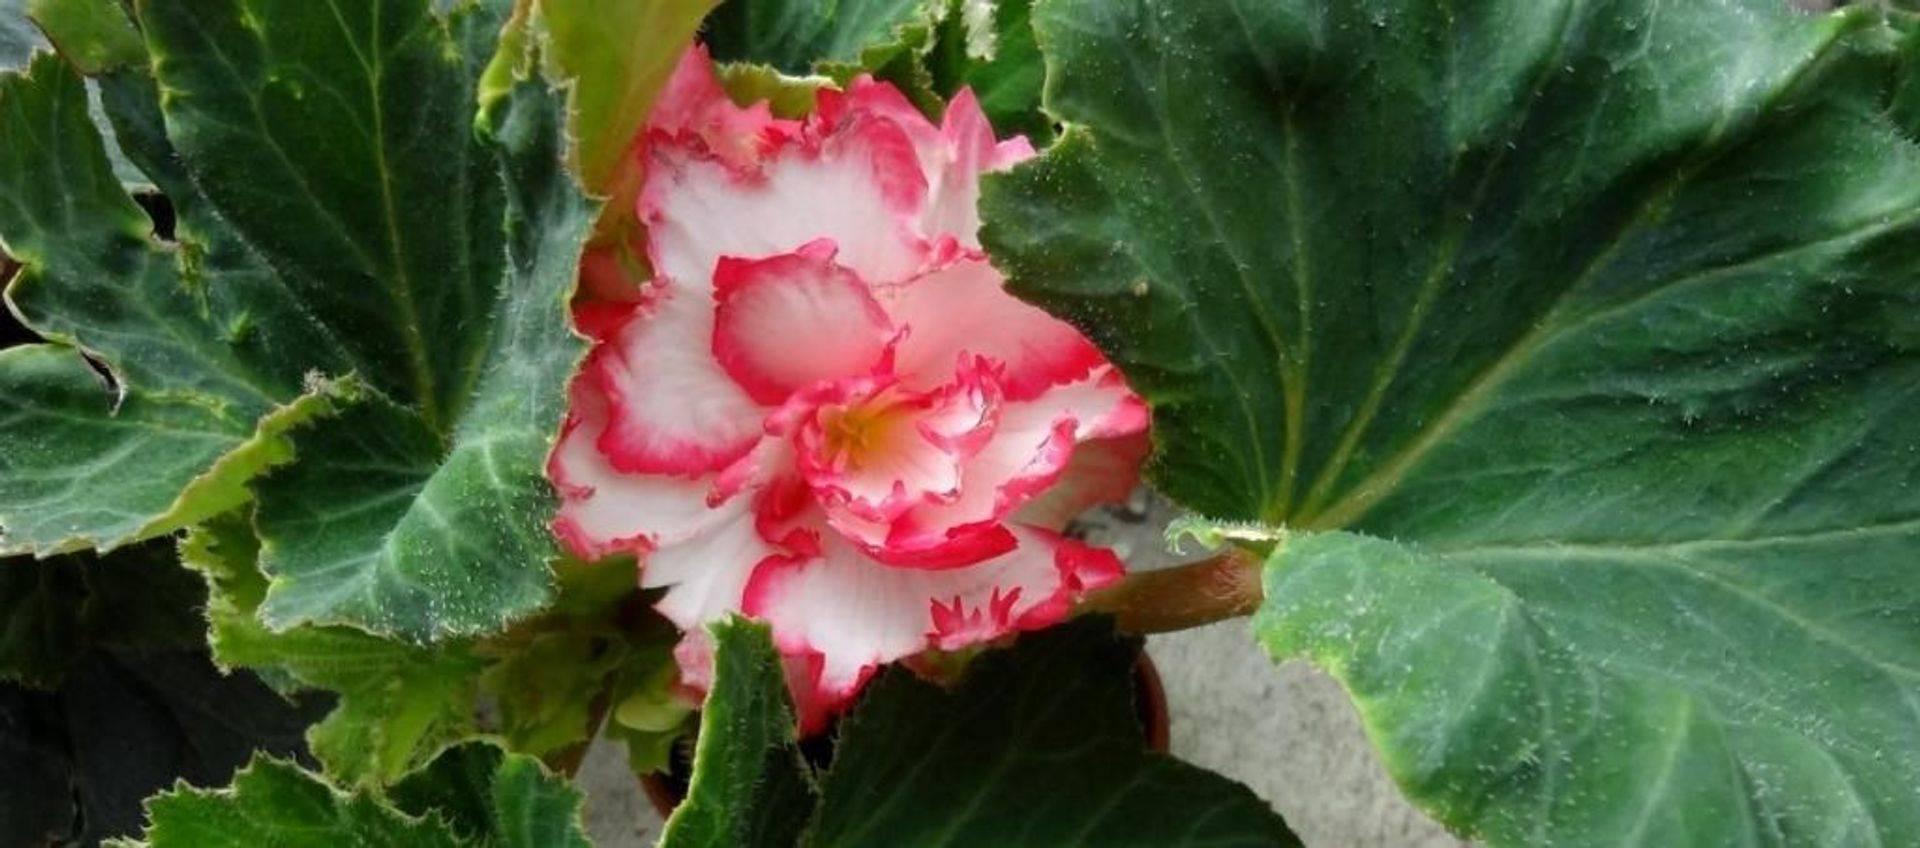 Pink and white Begonia